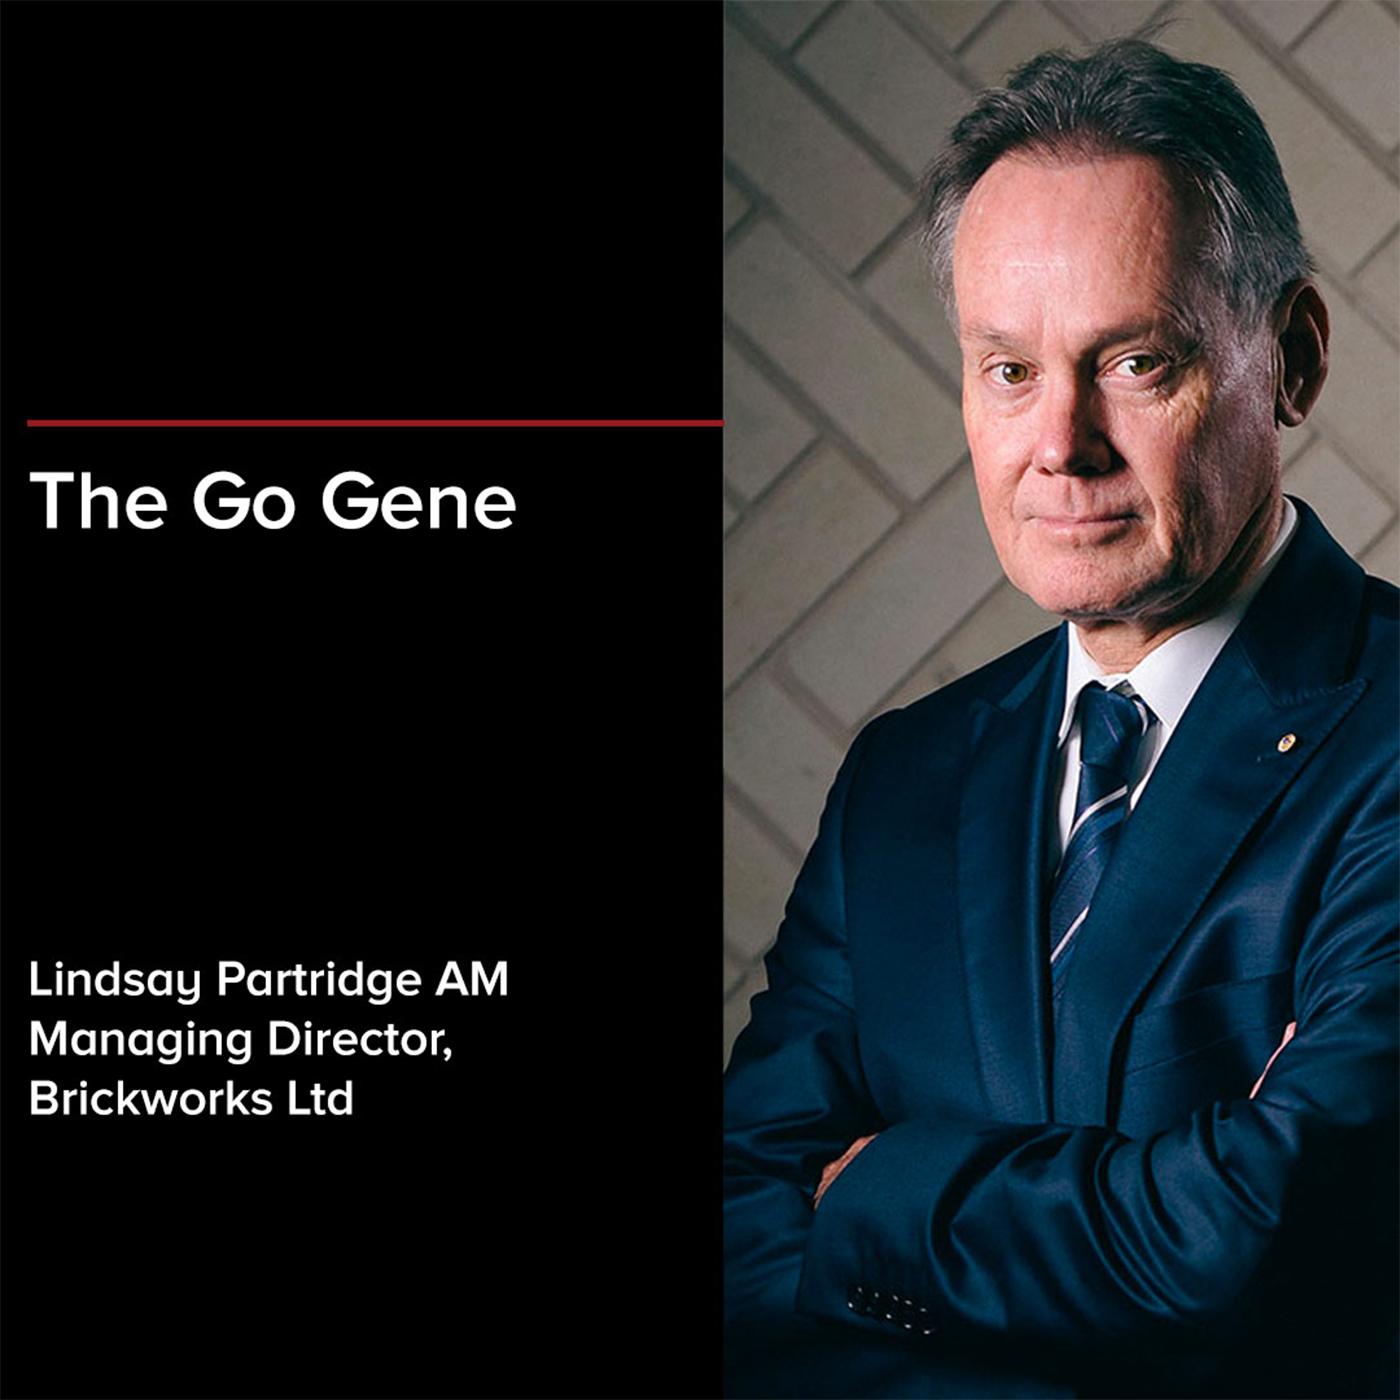 No Limitations: The Go Gene ft. Lindsay Partridge AM, Managing Director, Brickworks Limited